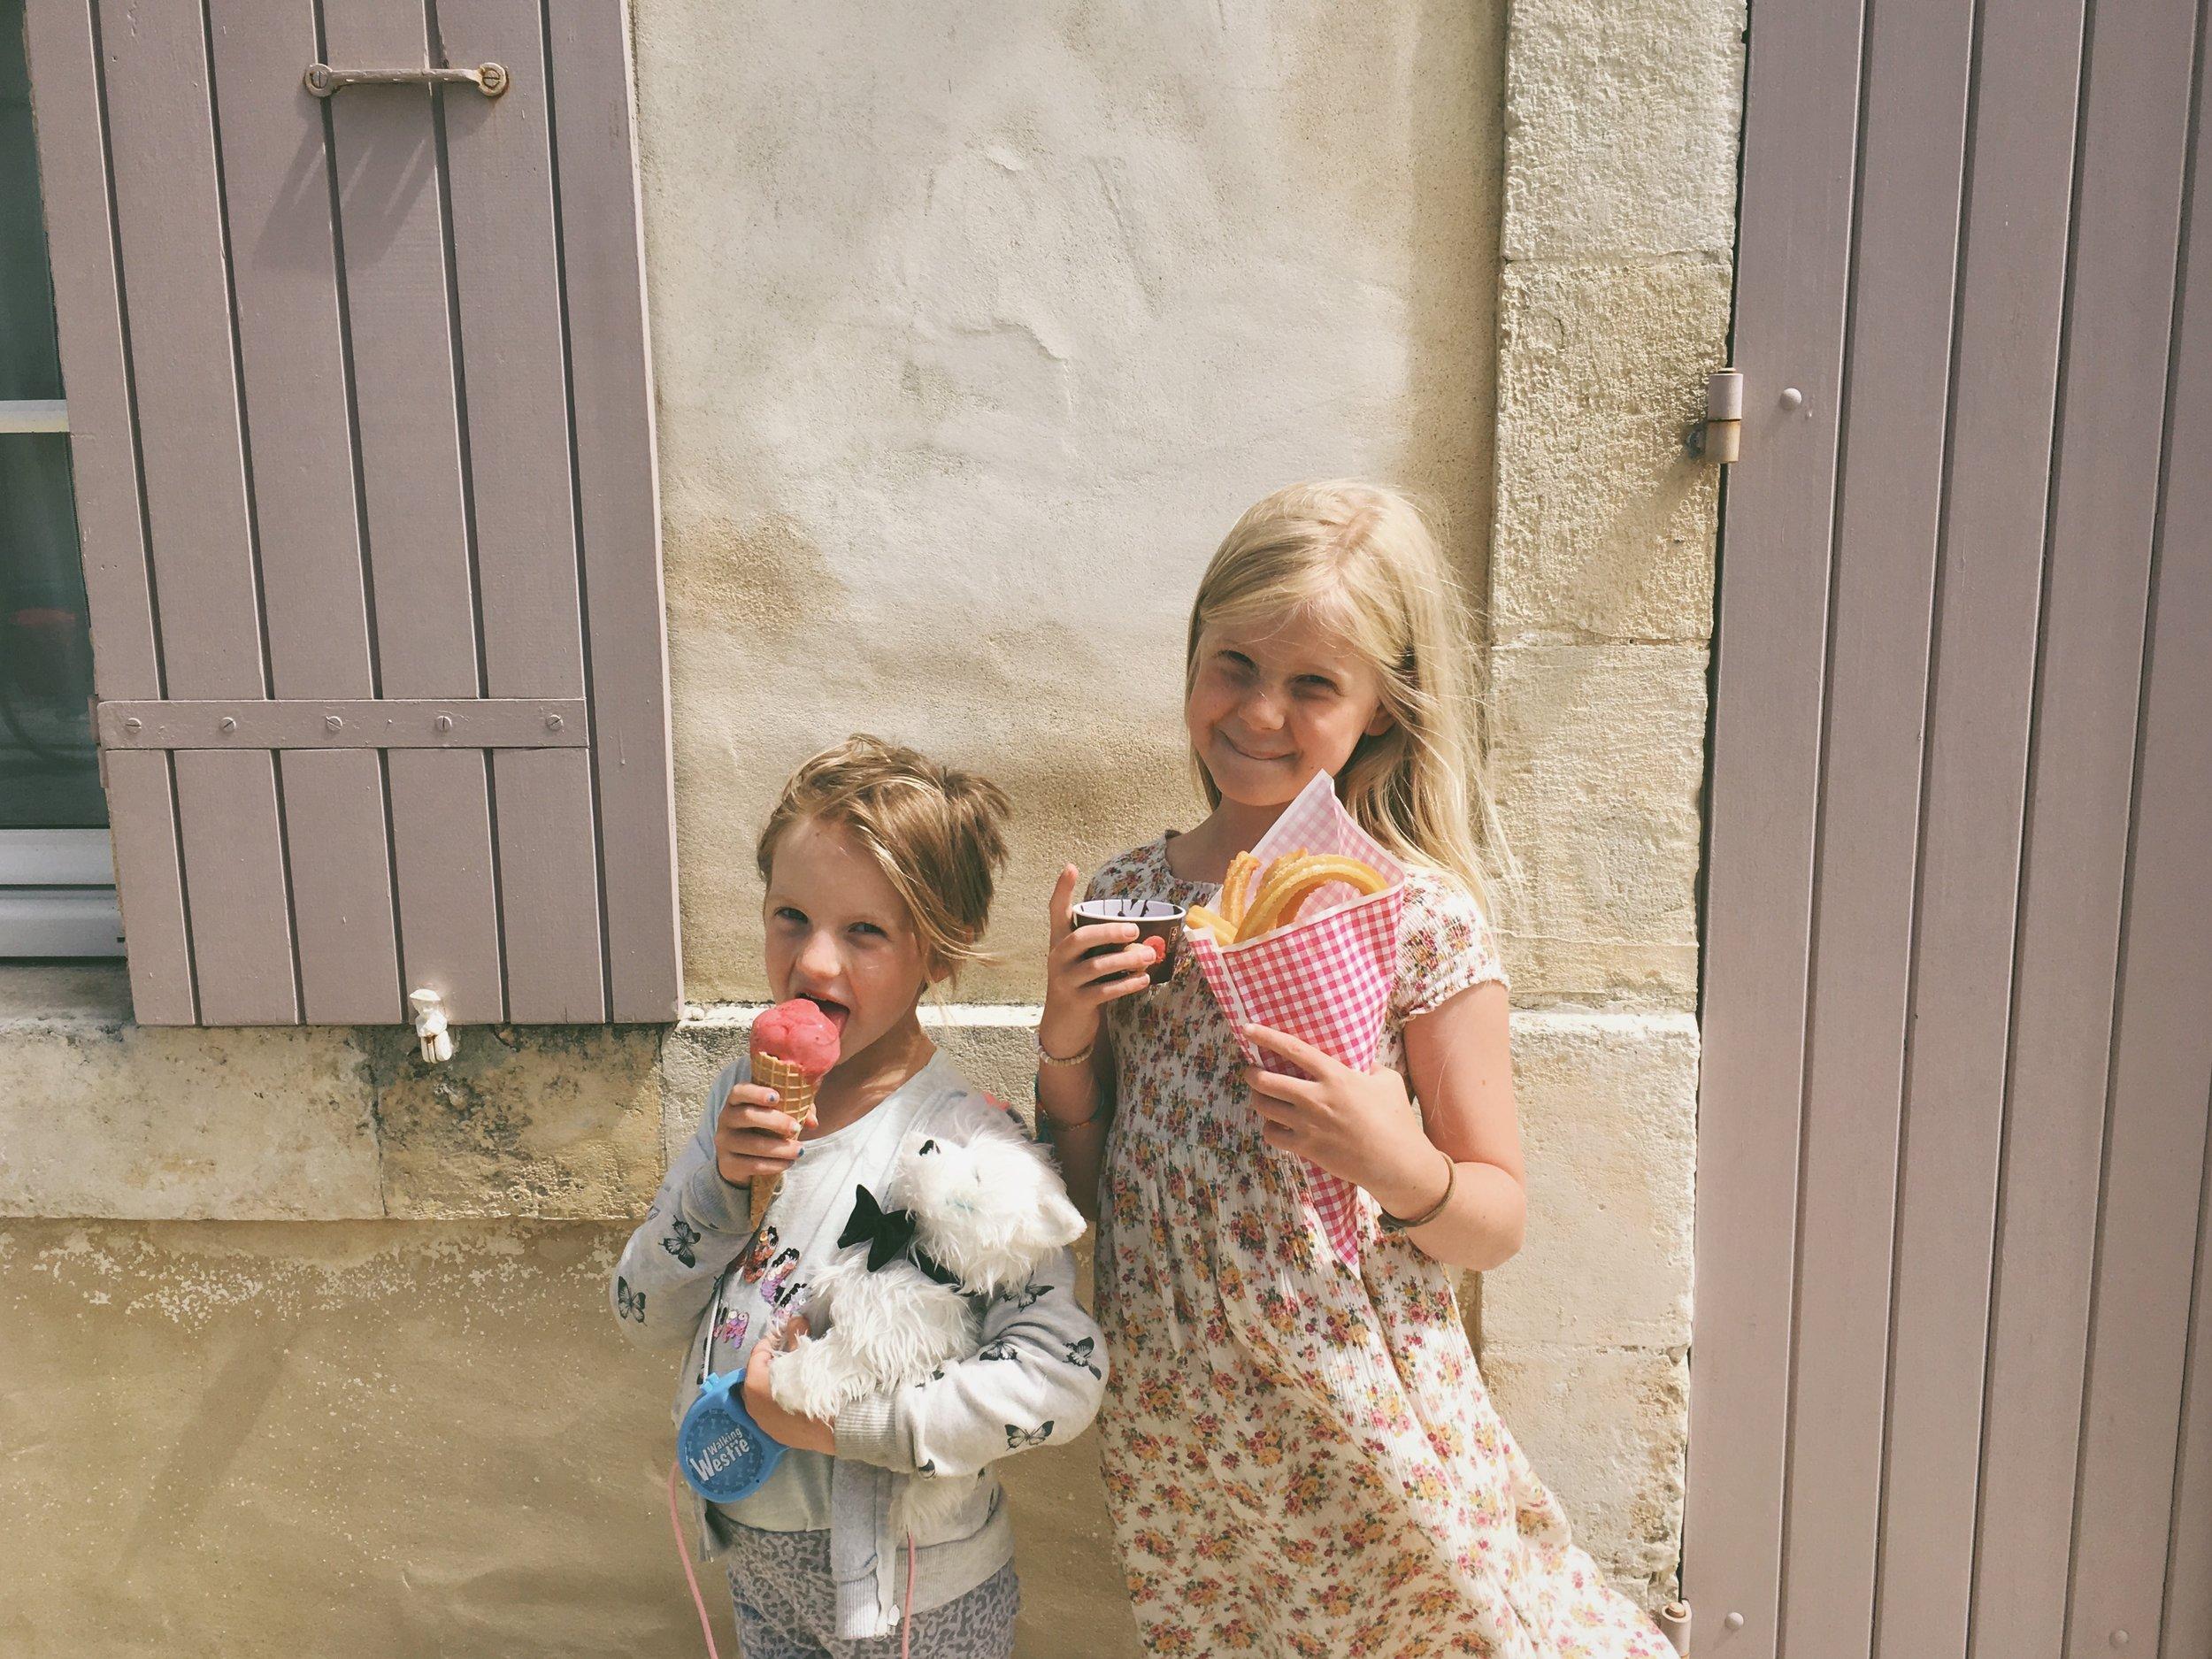 Françaises Vacances - Carolyn Carter Blog